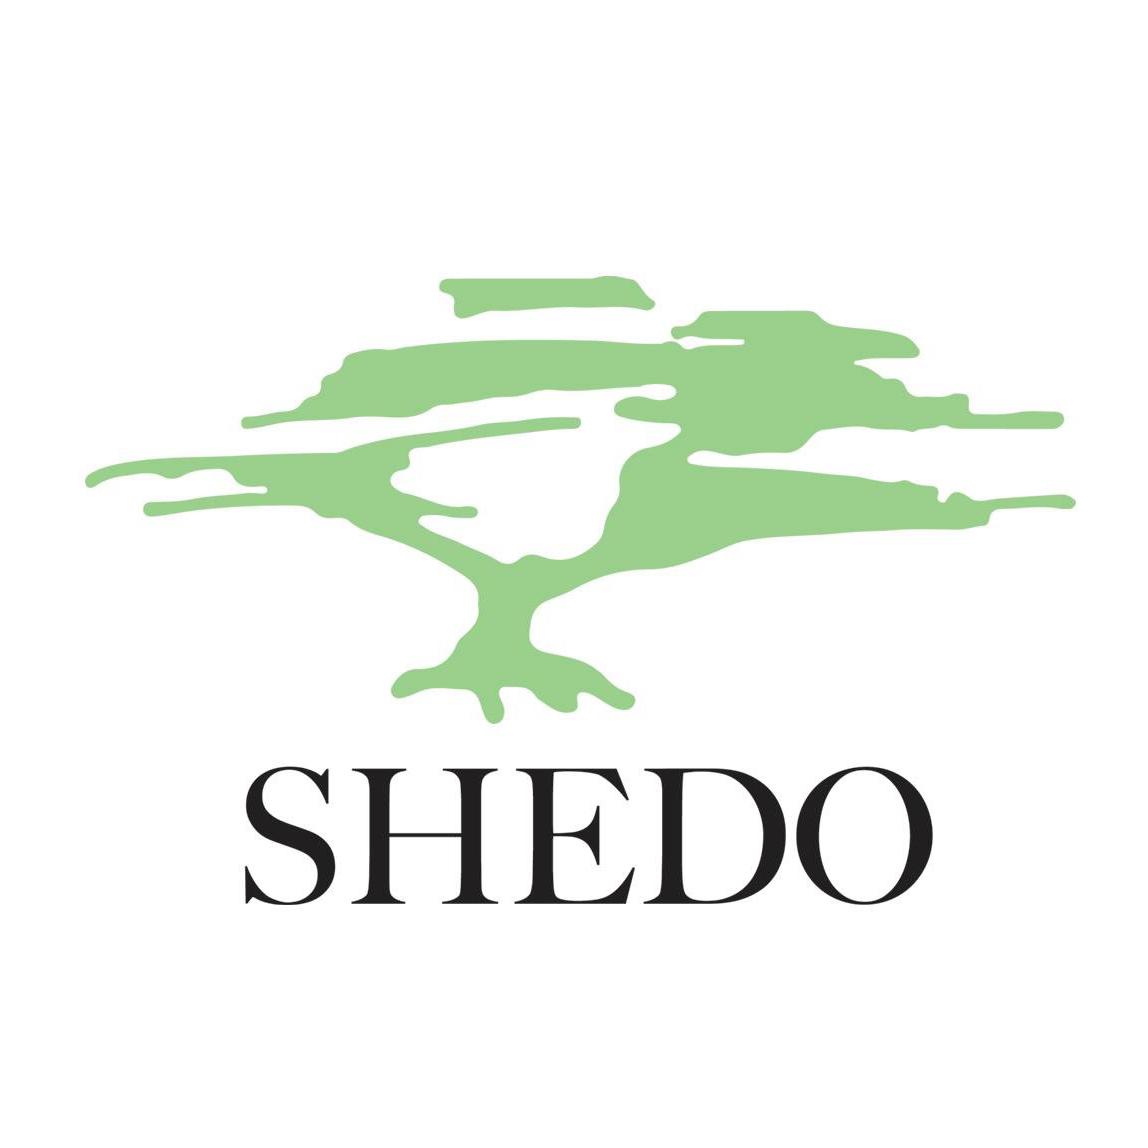 shedo-logga